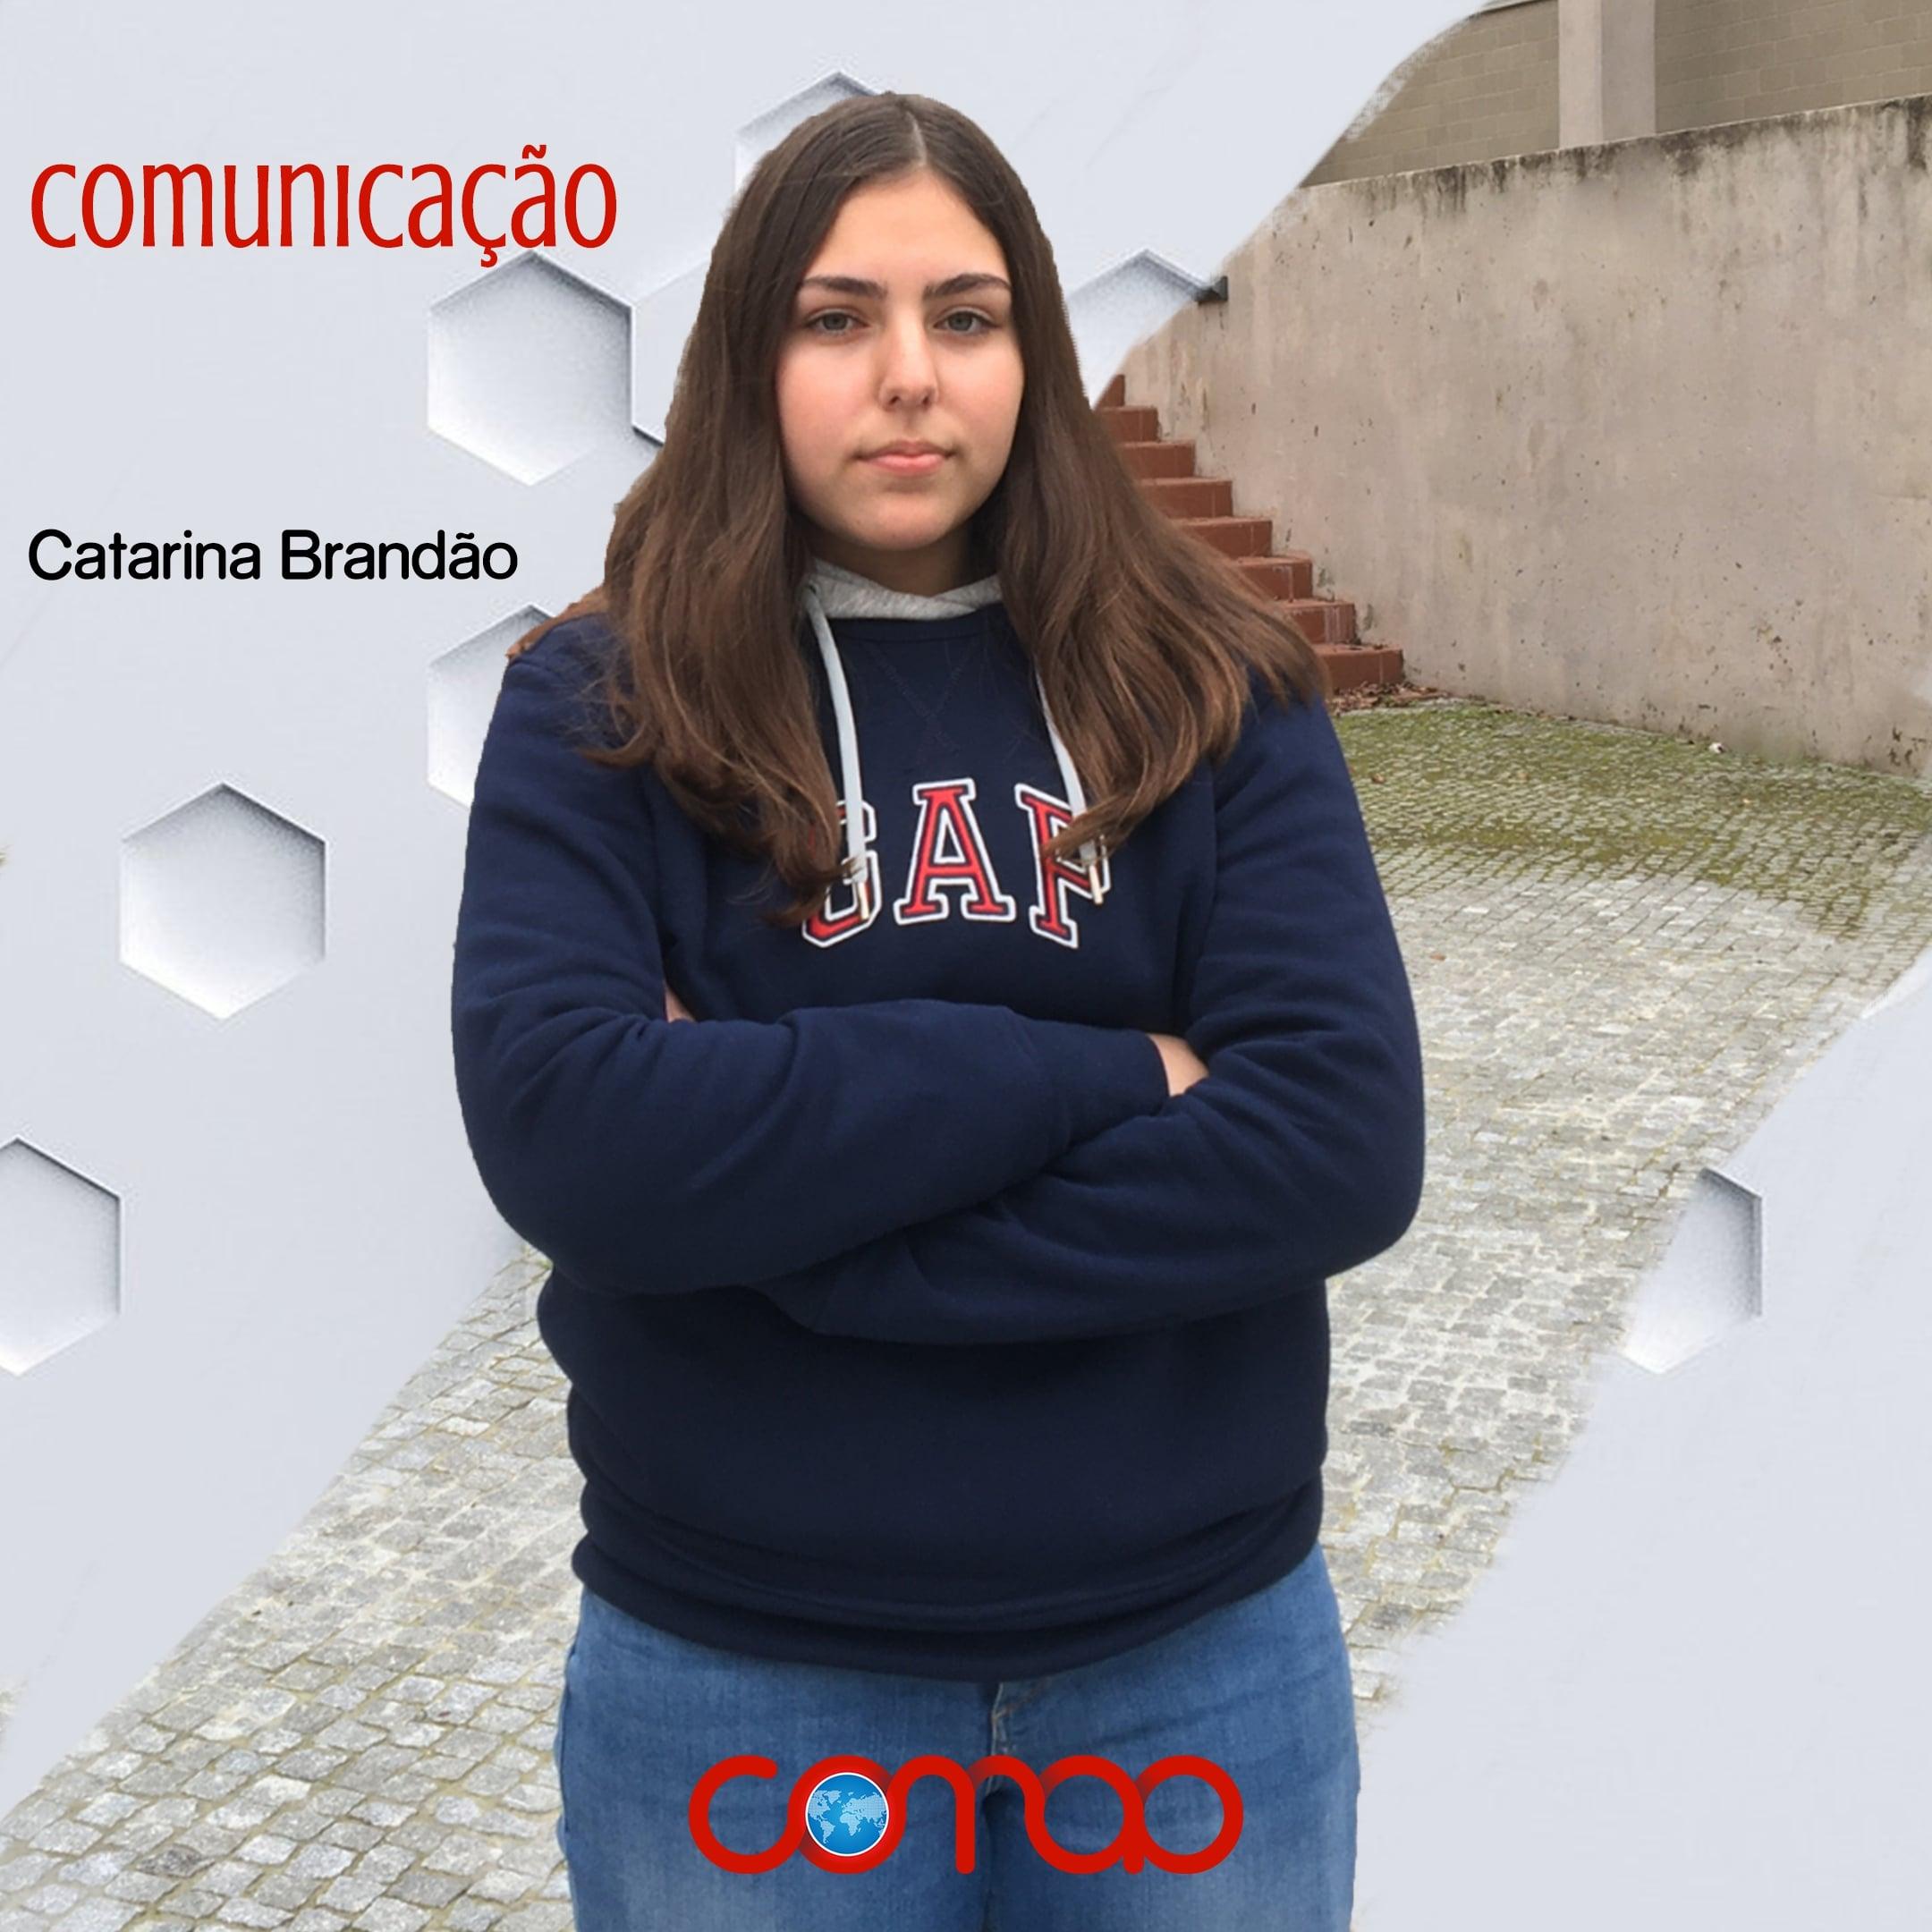 Catarina Brandão